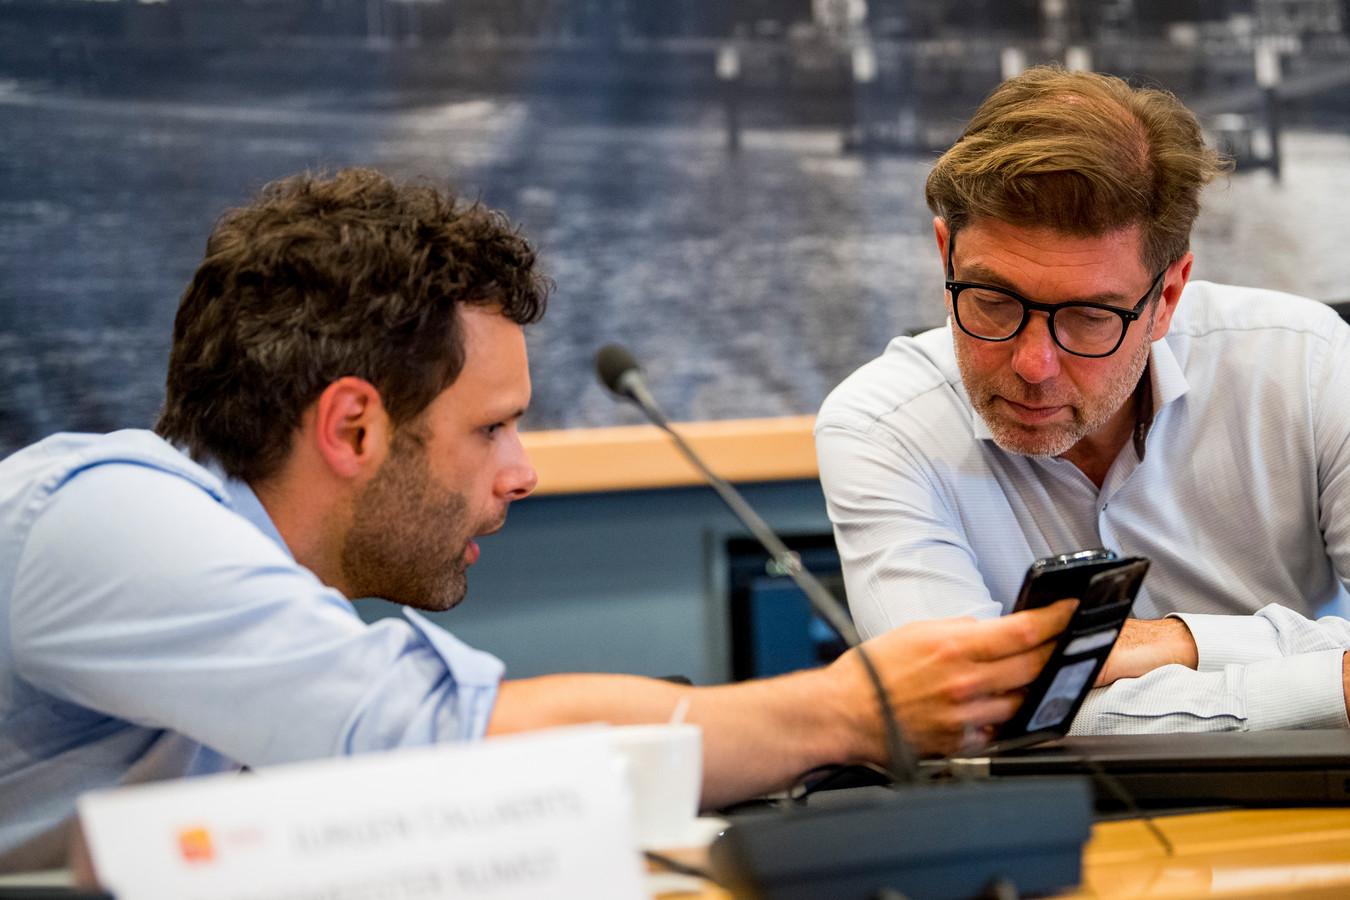 Les bourgmestres de Rumst Jurgen Callaerts (g) et de Boom Jeroen Baert (d), tous deux membres de la N-VA, lors d'une conférence de presse ce jeudi 17 juin 2021.